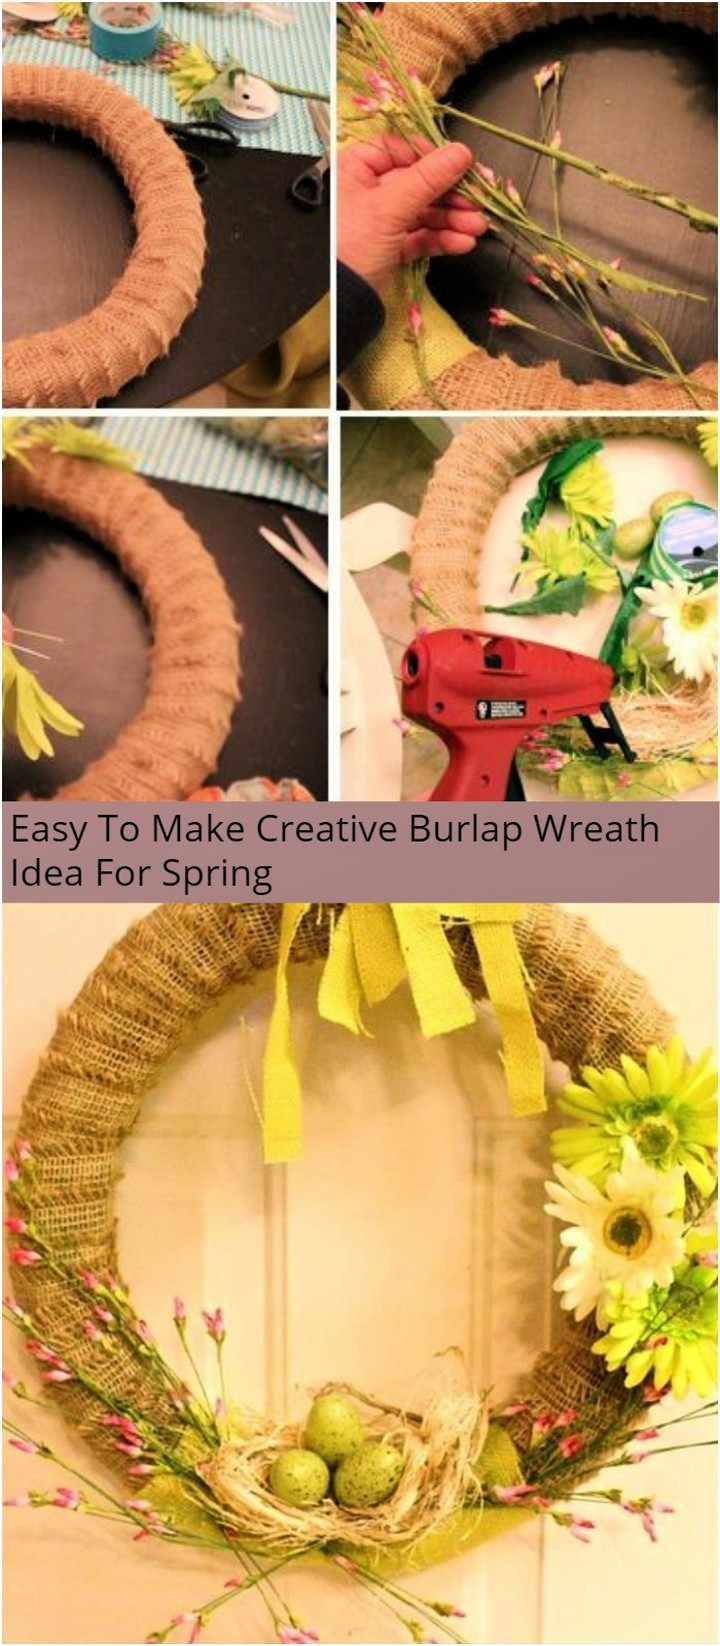 Easy To Make Creative Burlap Wreath Idea For Spring